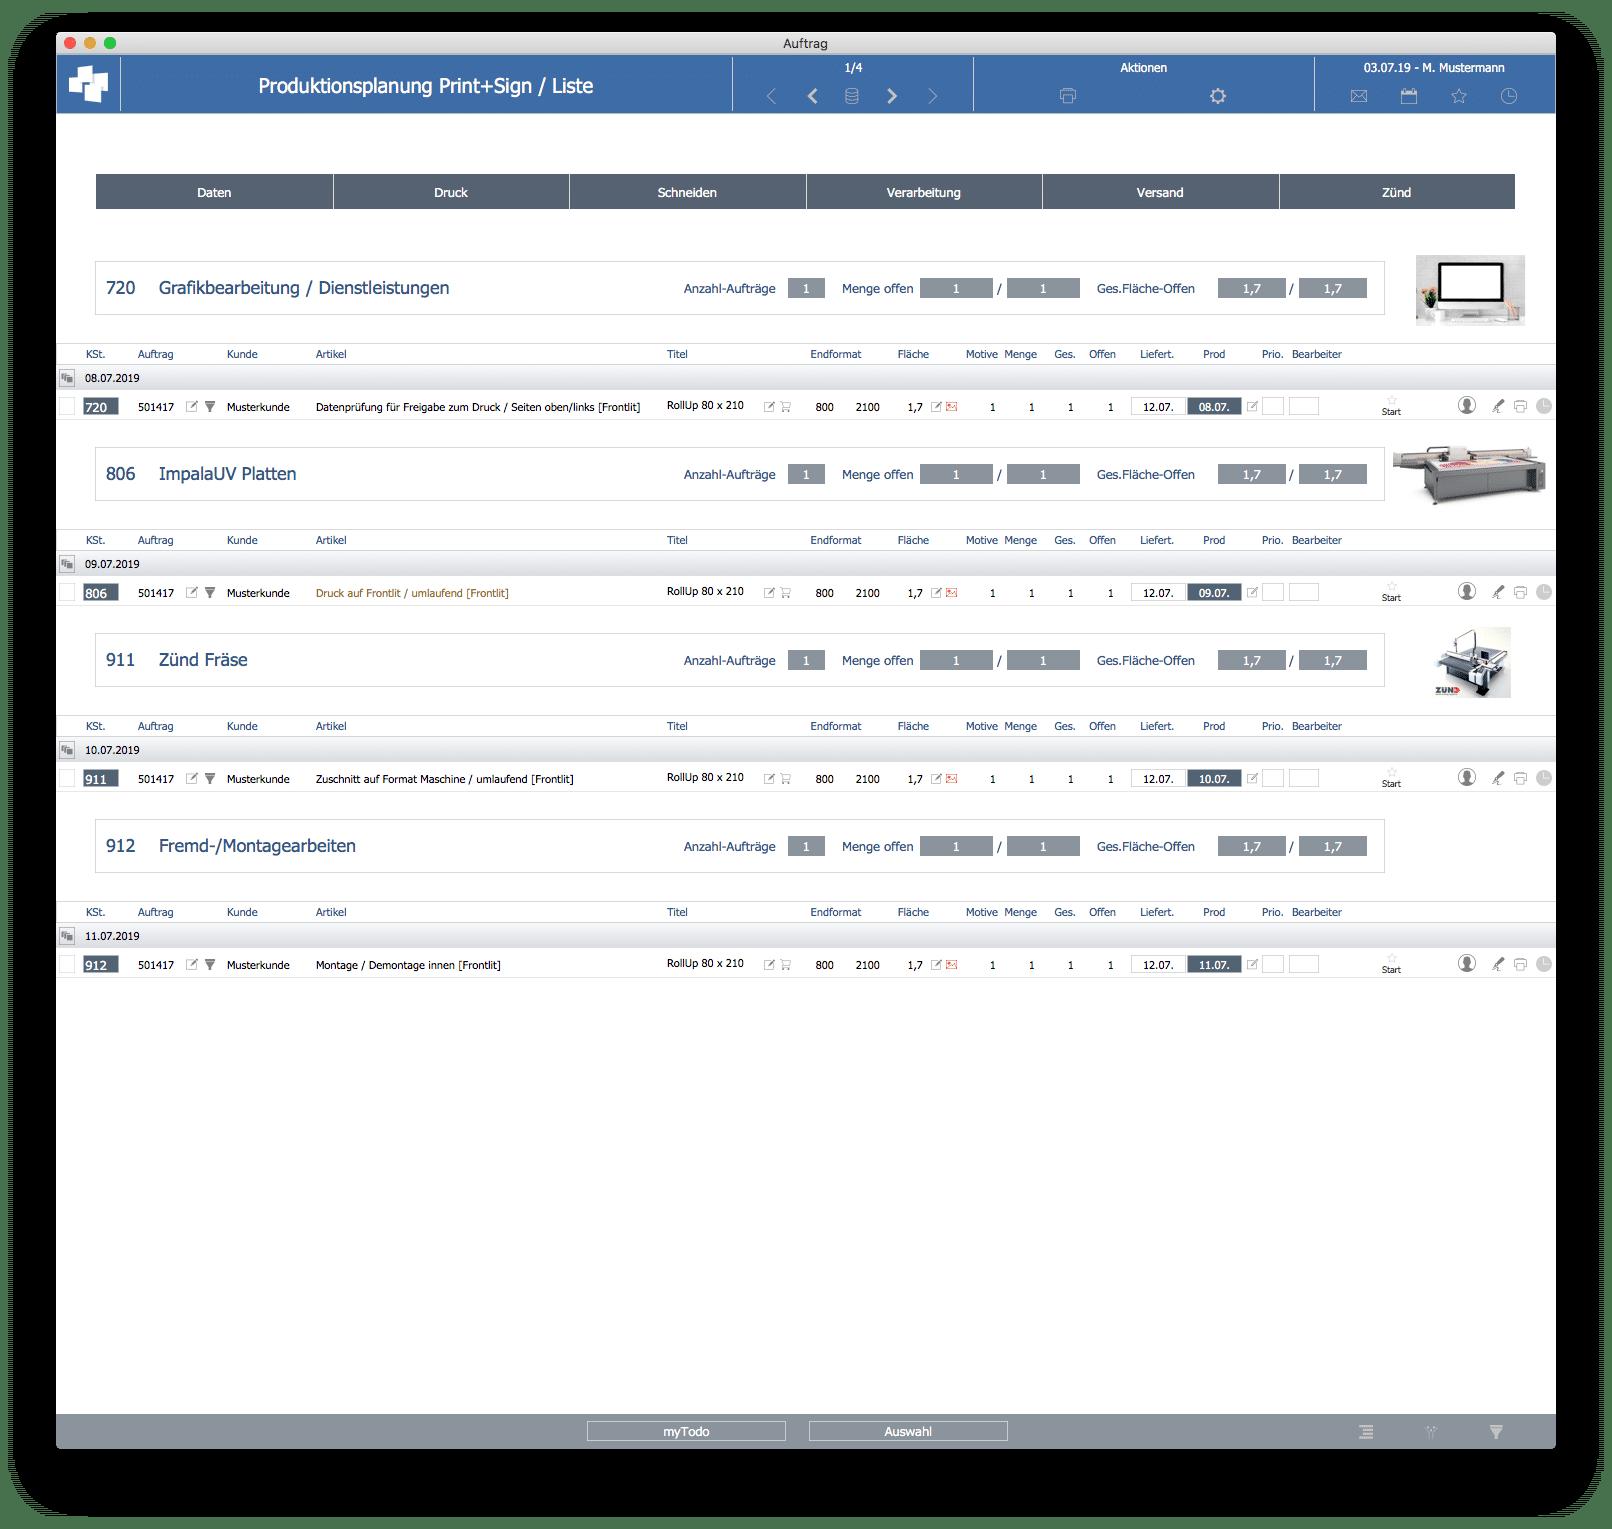 advanter 5.0 Produktionsplanung